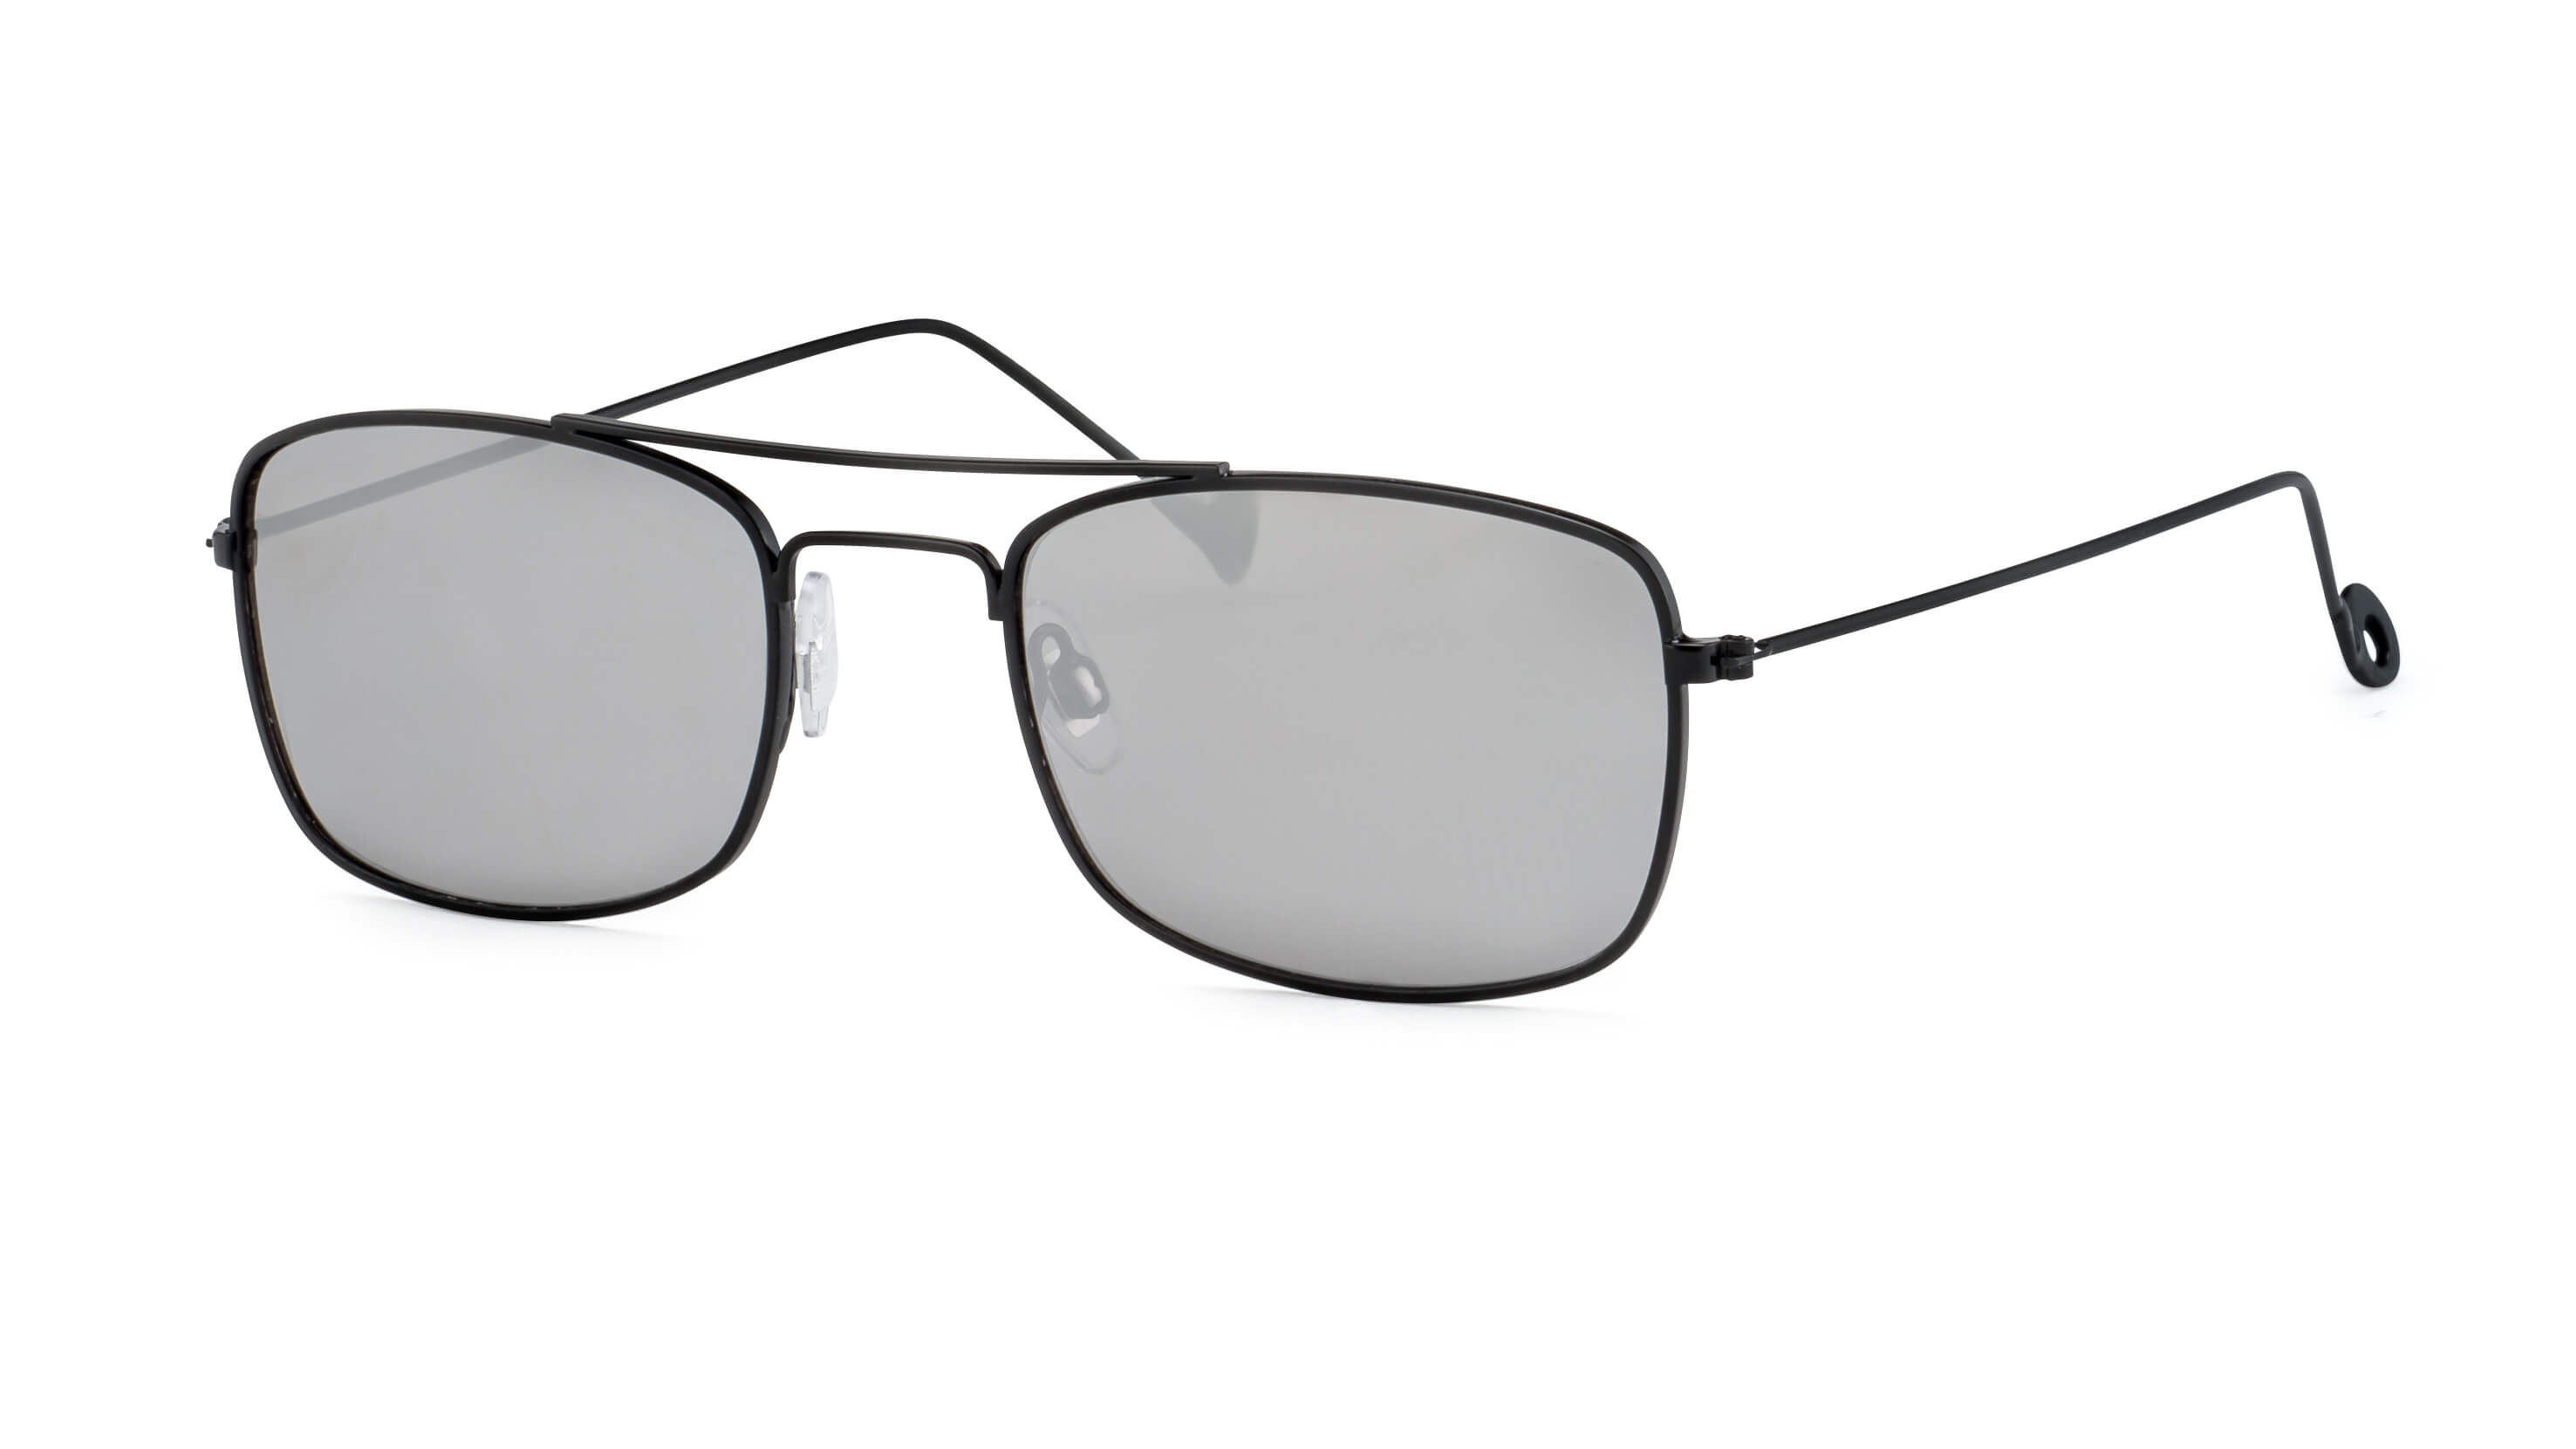 Main view sunglasses F3025100